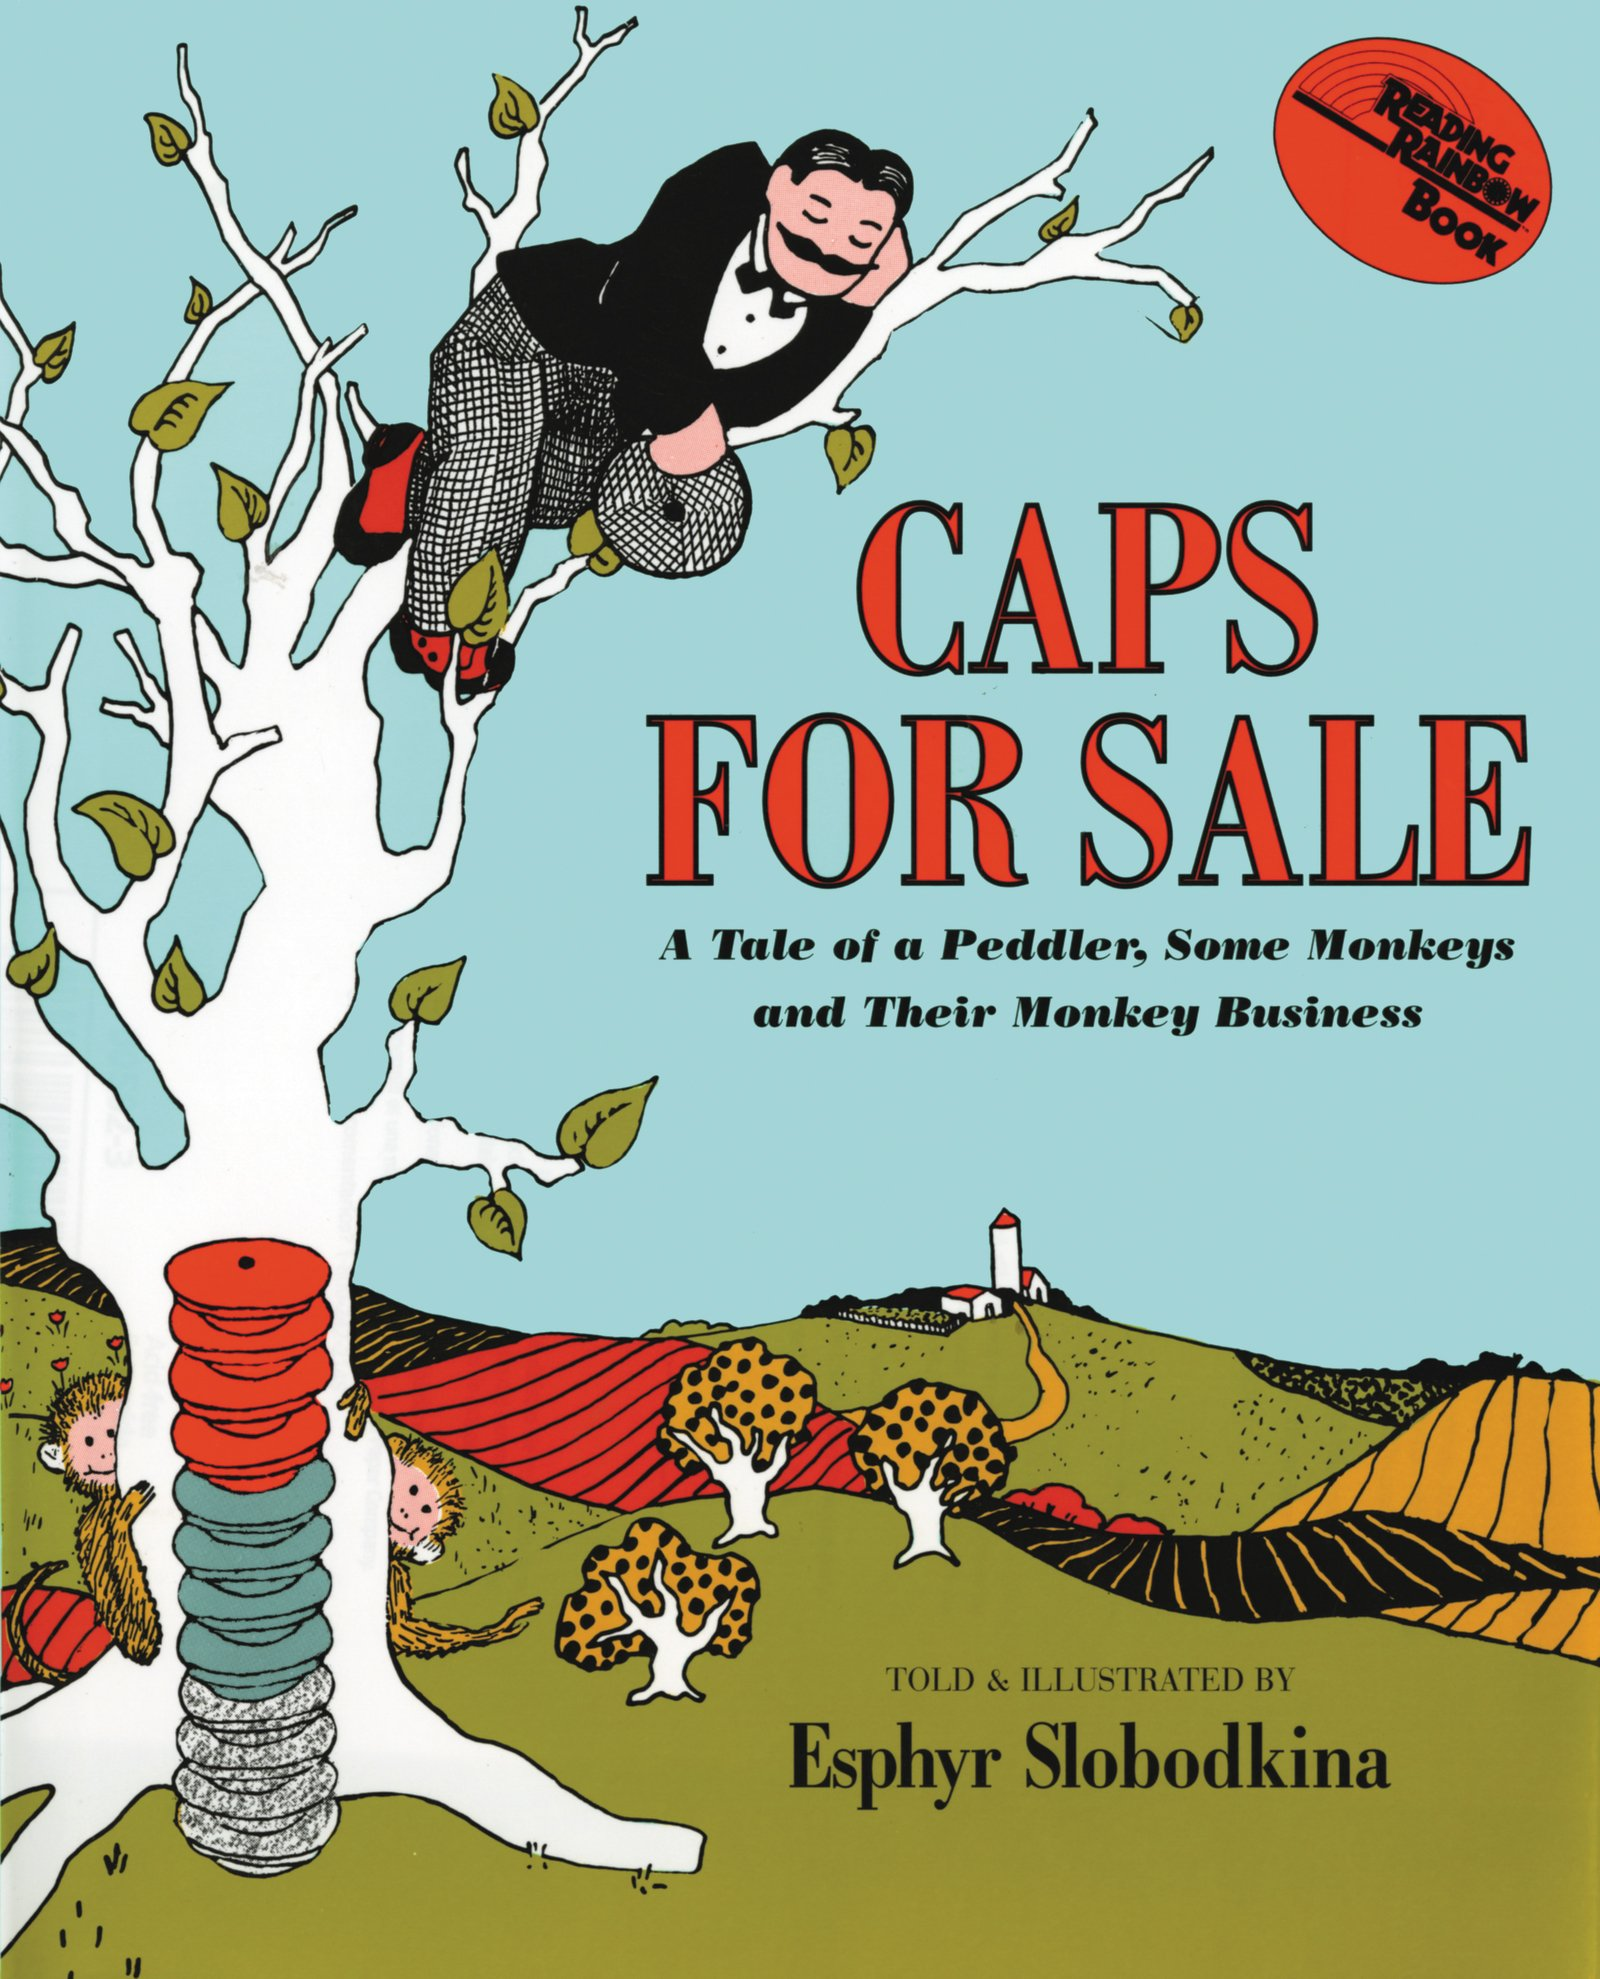 Caps for Sale: A Tale of a Peddler, Some Monkeys and Their Monkey Business: Slobodkina, Esphyr, Slobodkina, Esphyr: Amazon.com: Books